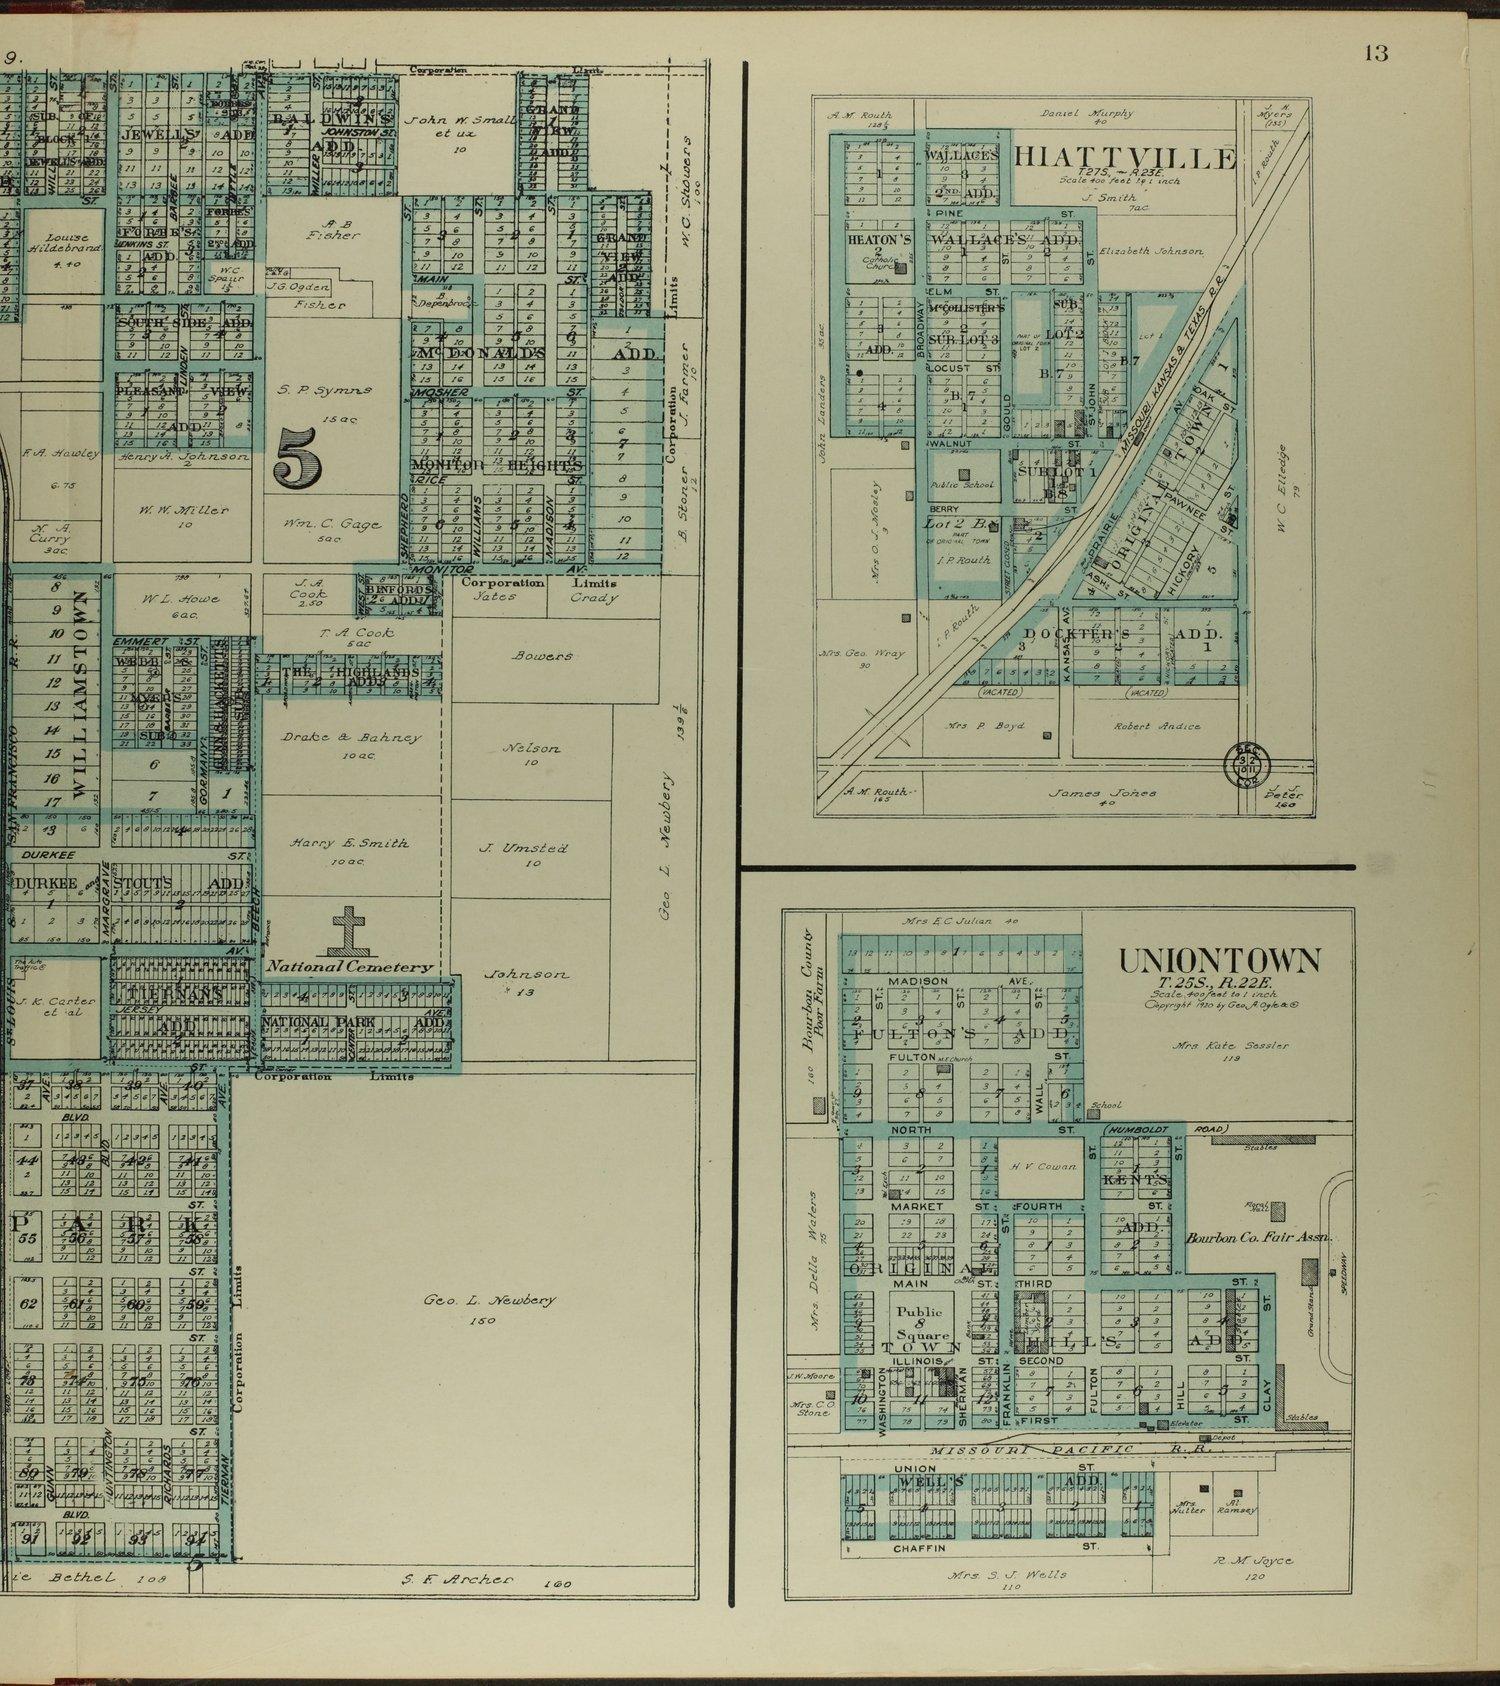 Standard atlas of Bourbon County, Kansas - 13